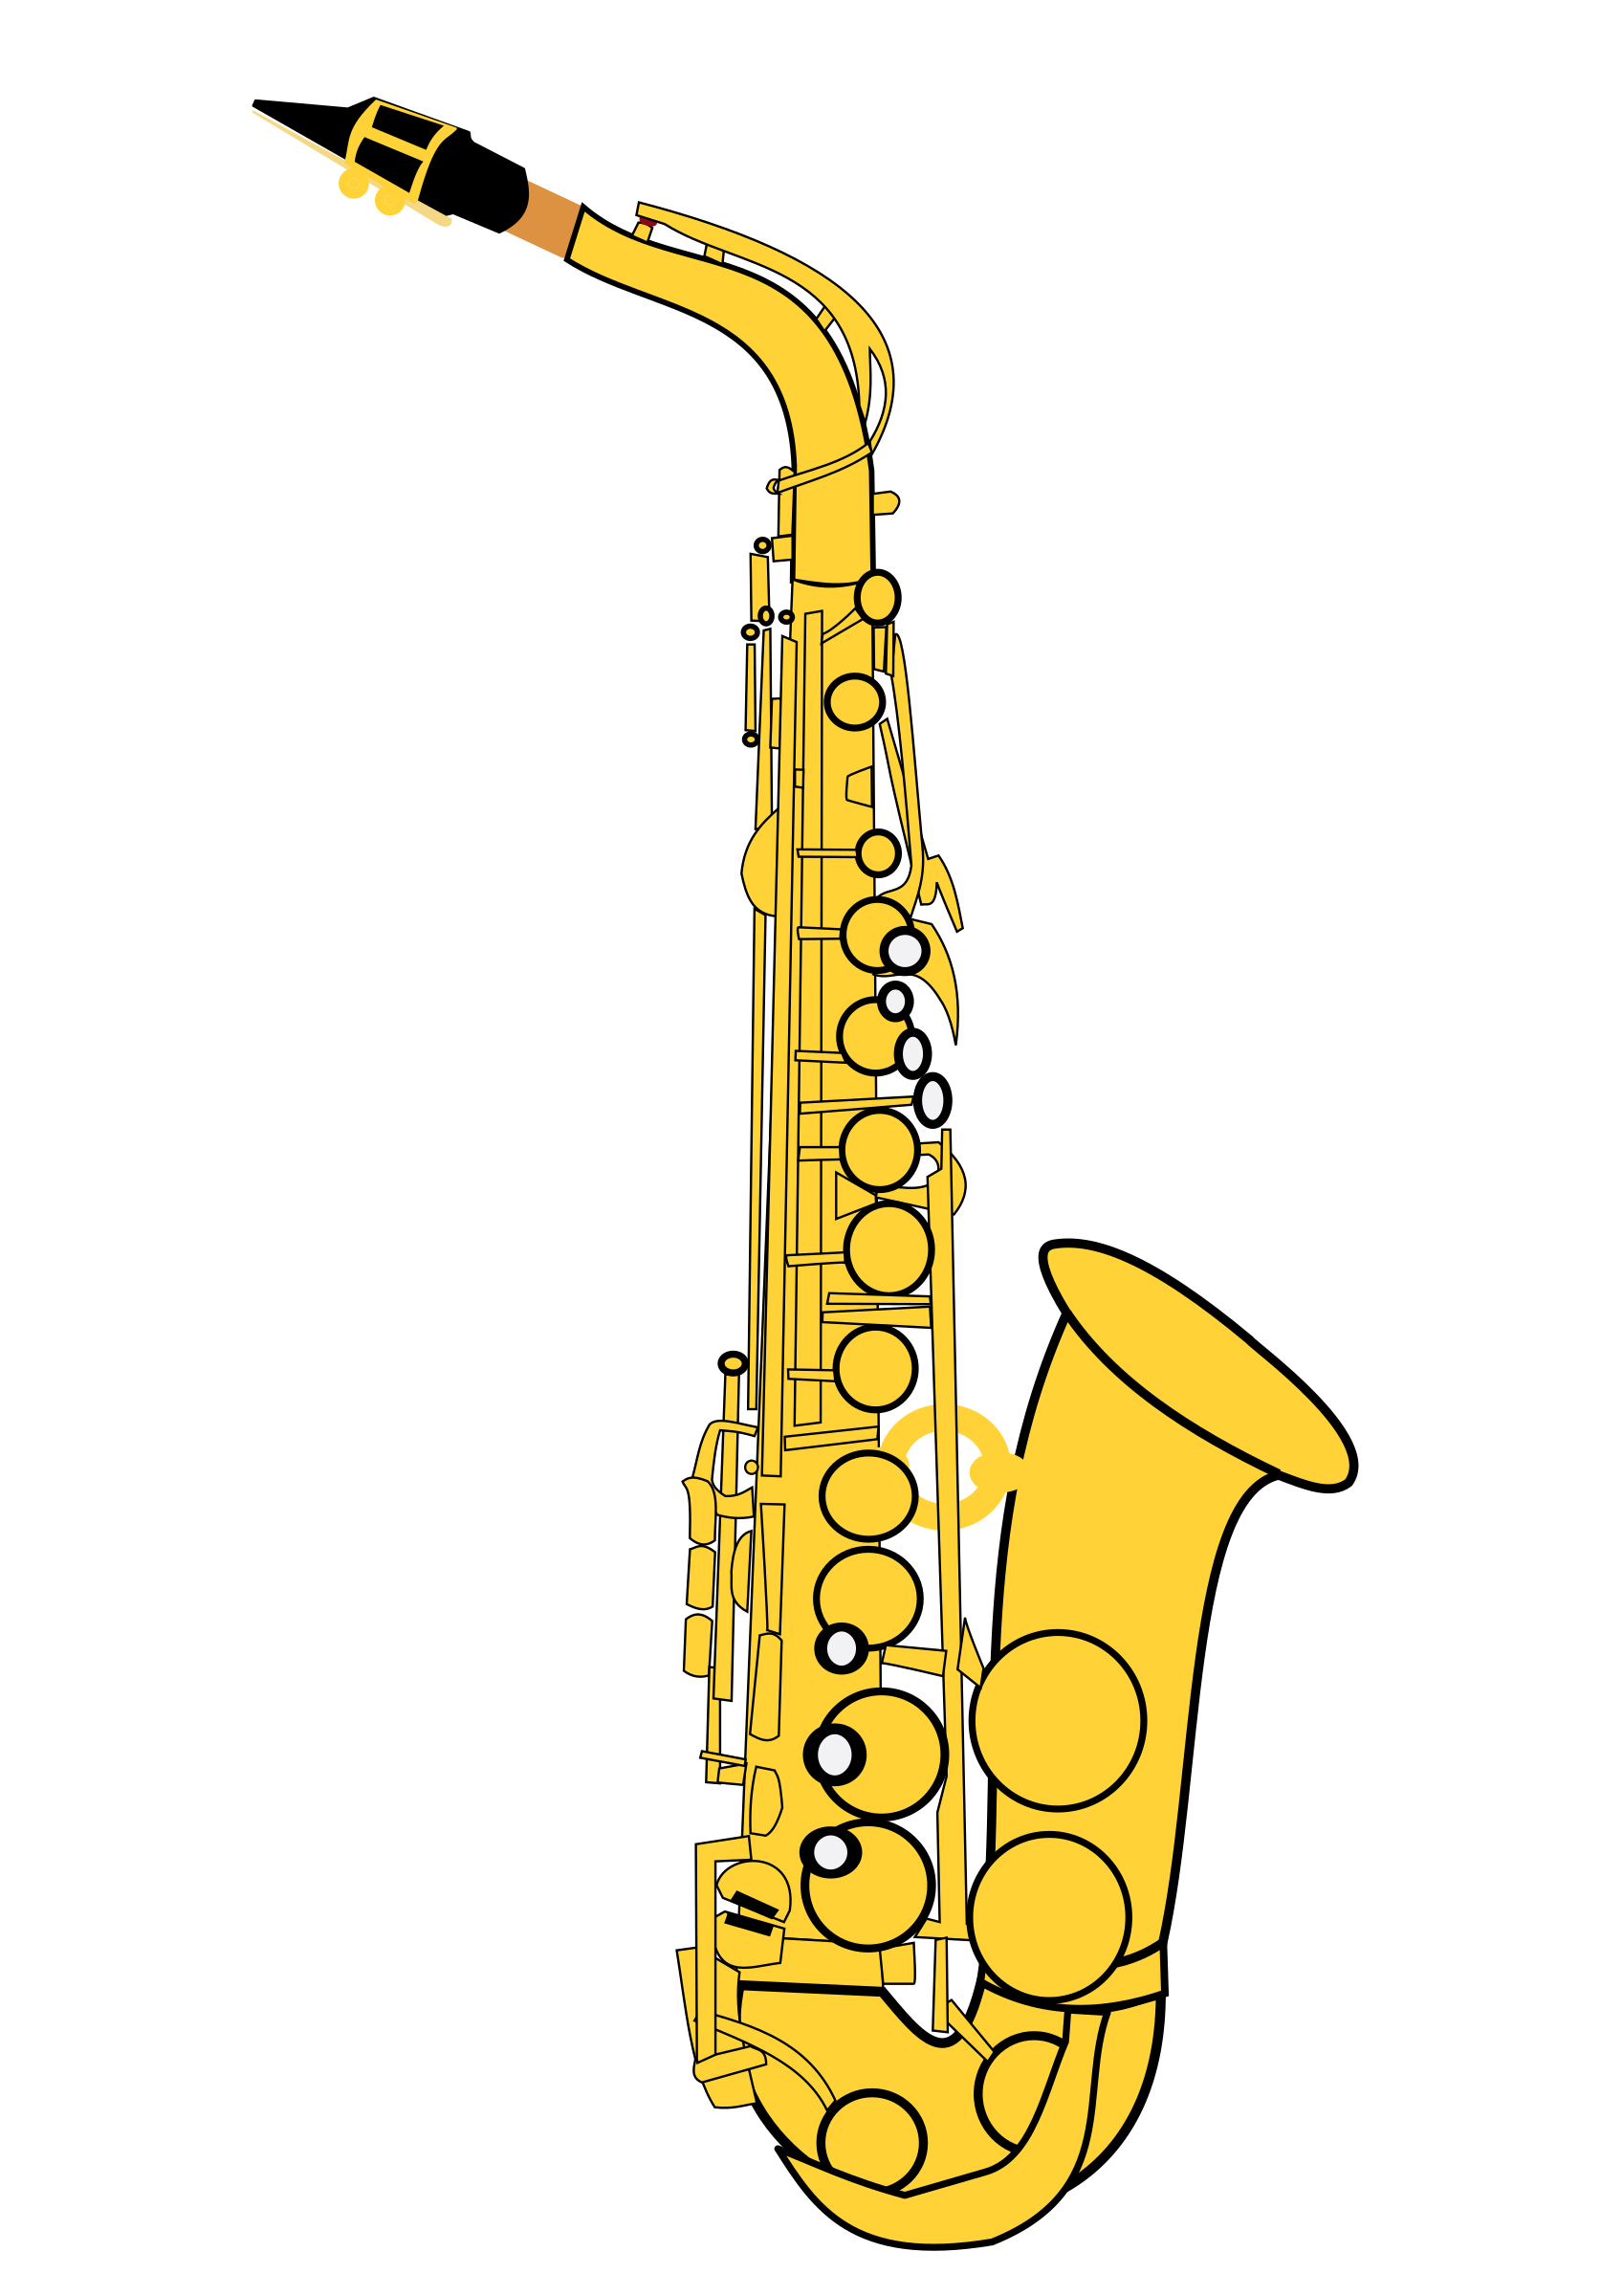 Clarinet clipart cartoon. Alto saxophone big image